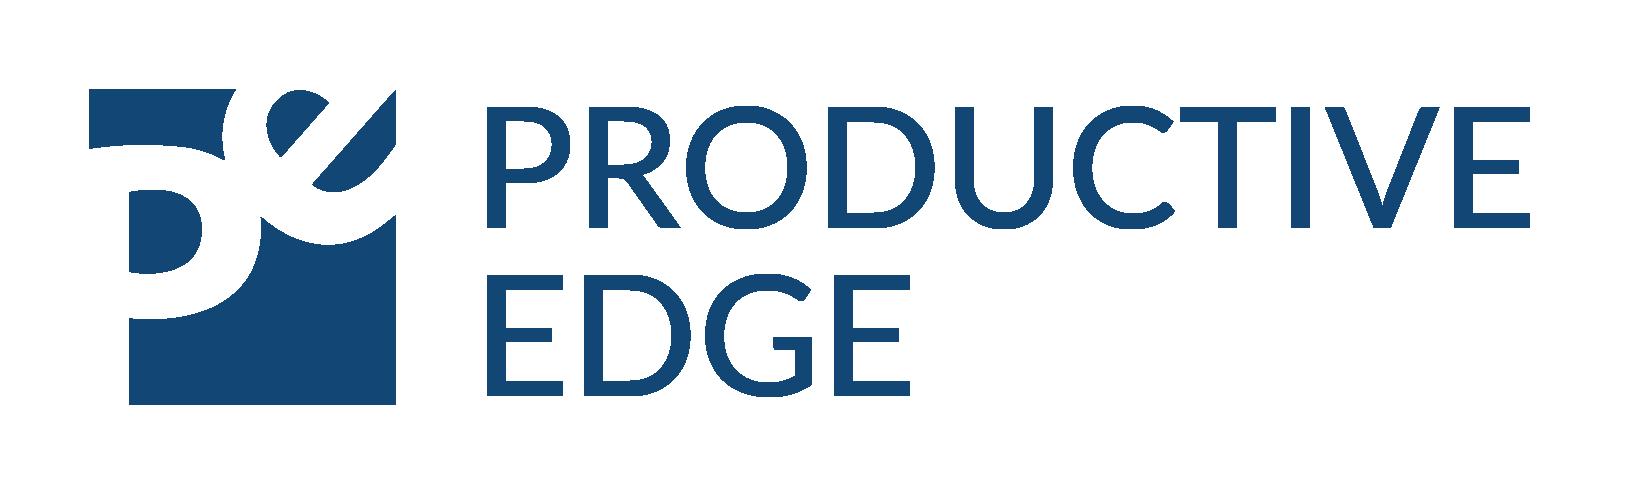 Productive Edge